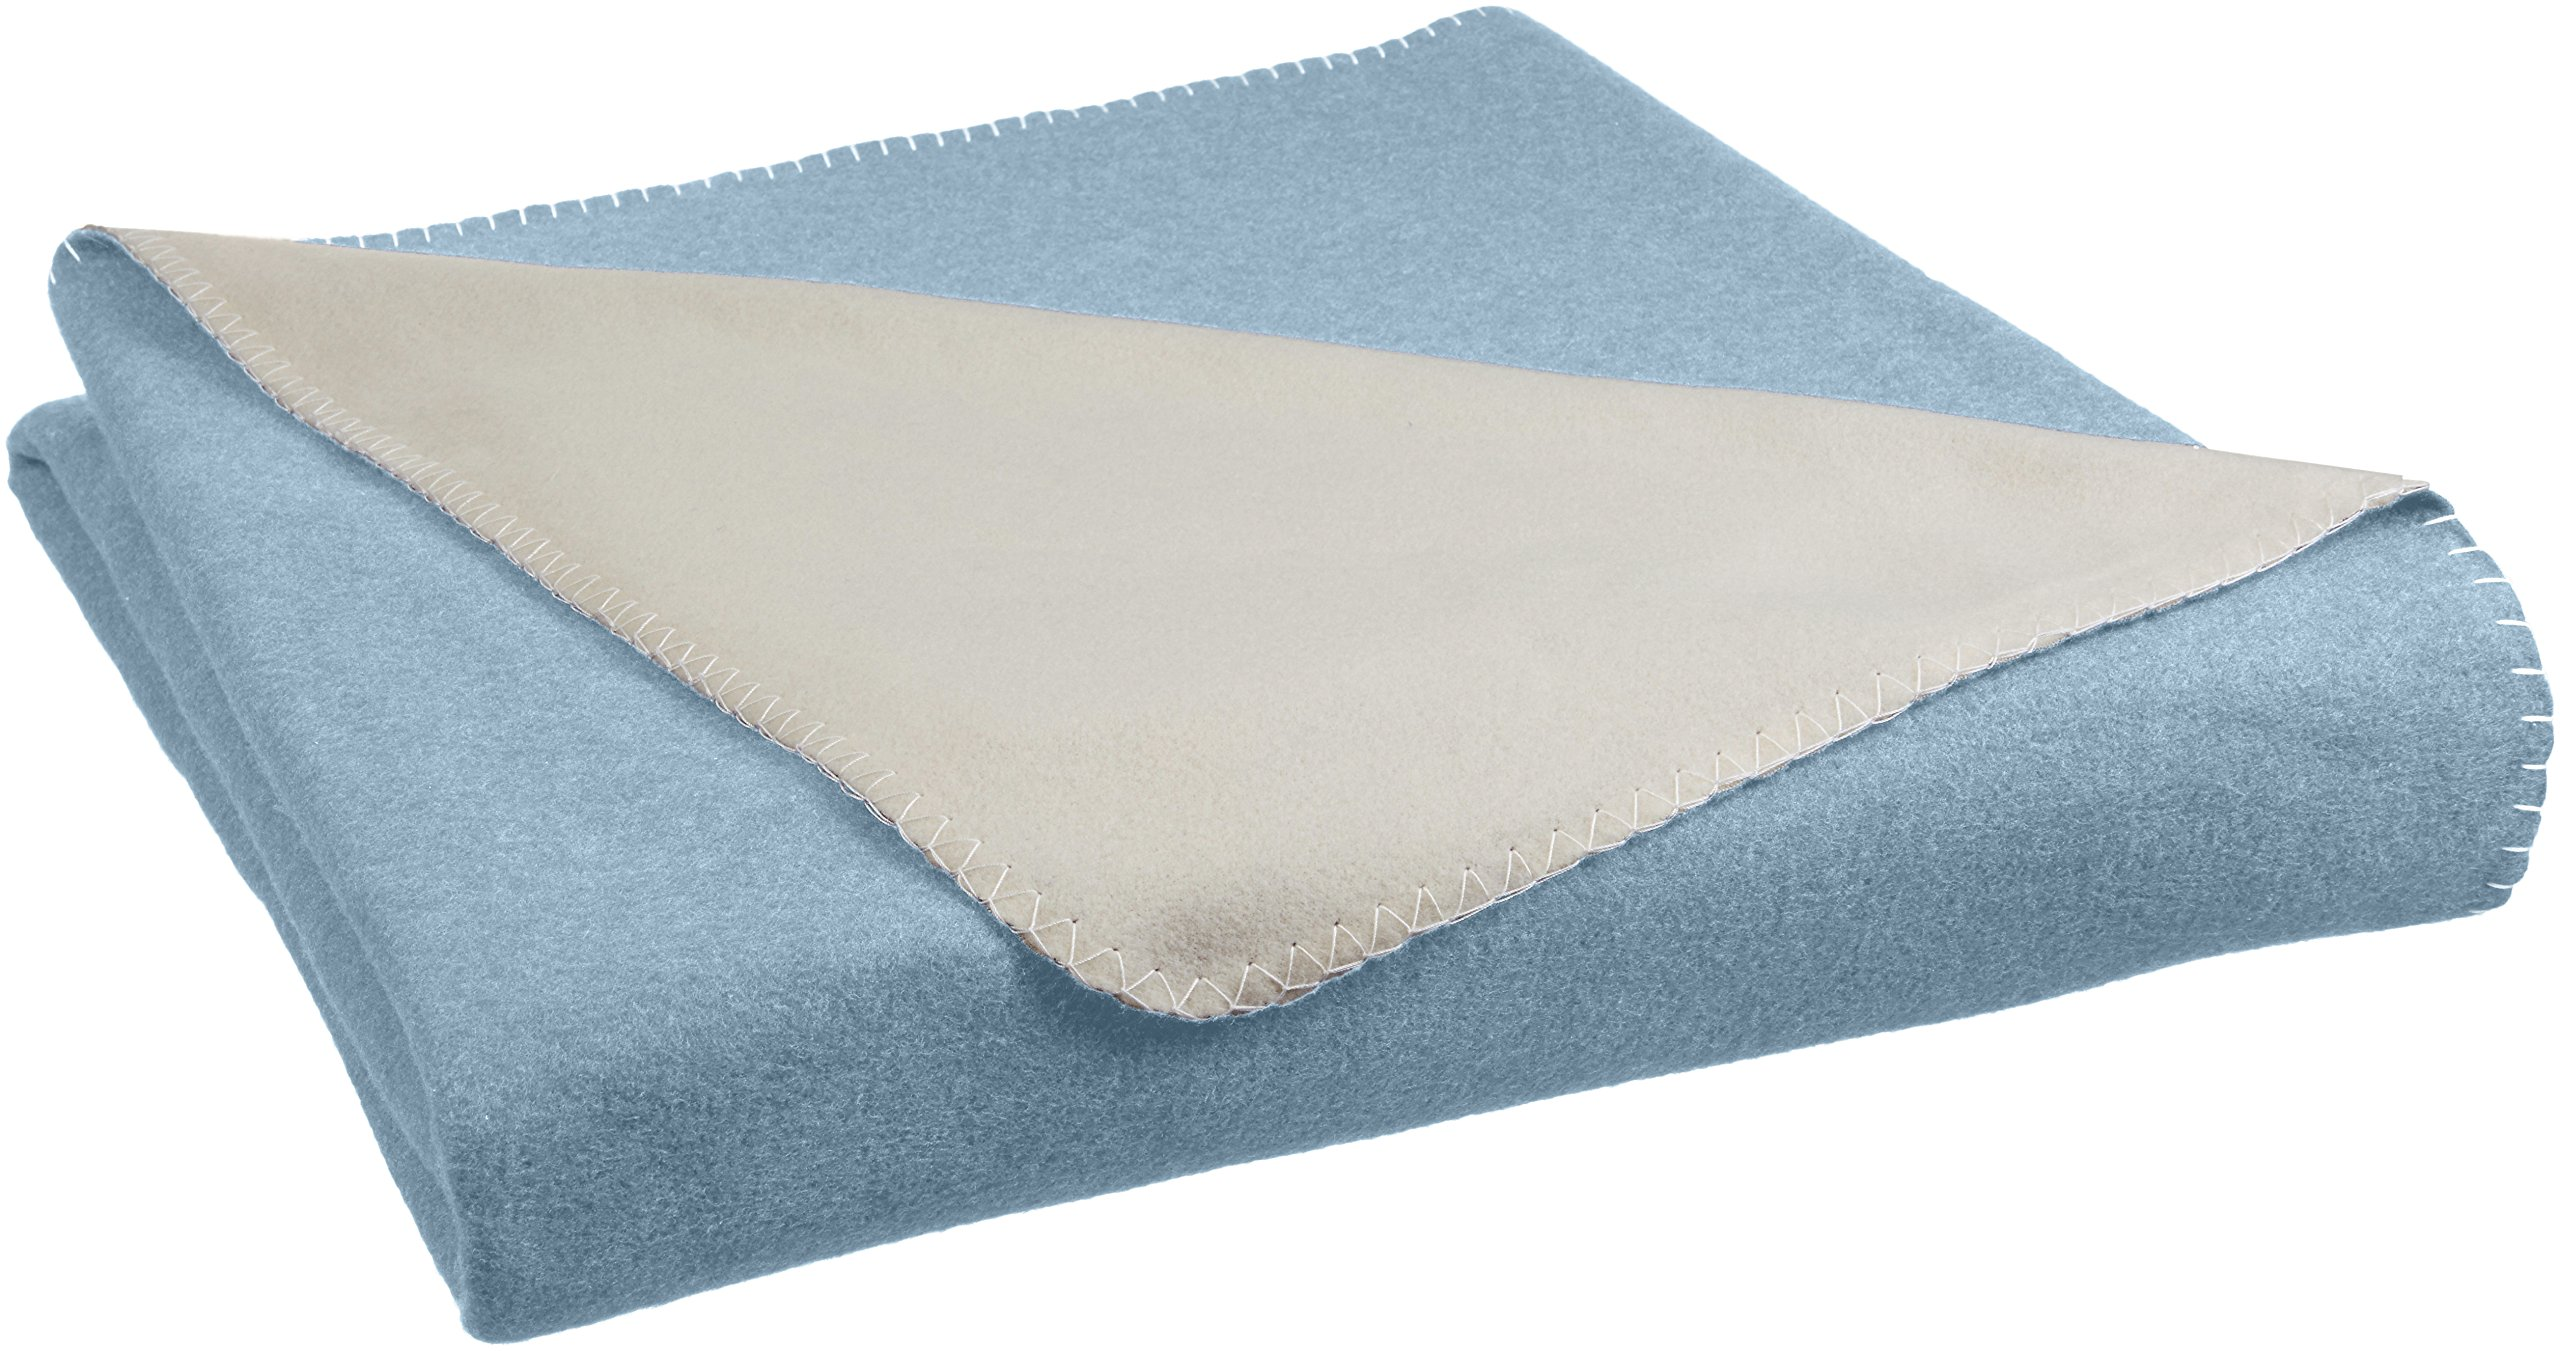 AmazonBasics Reversible Fleece Blanket - Throw, Spa Blue/Taupe